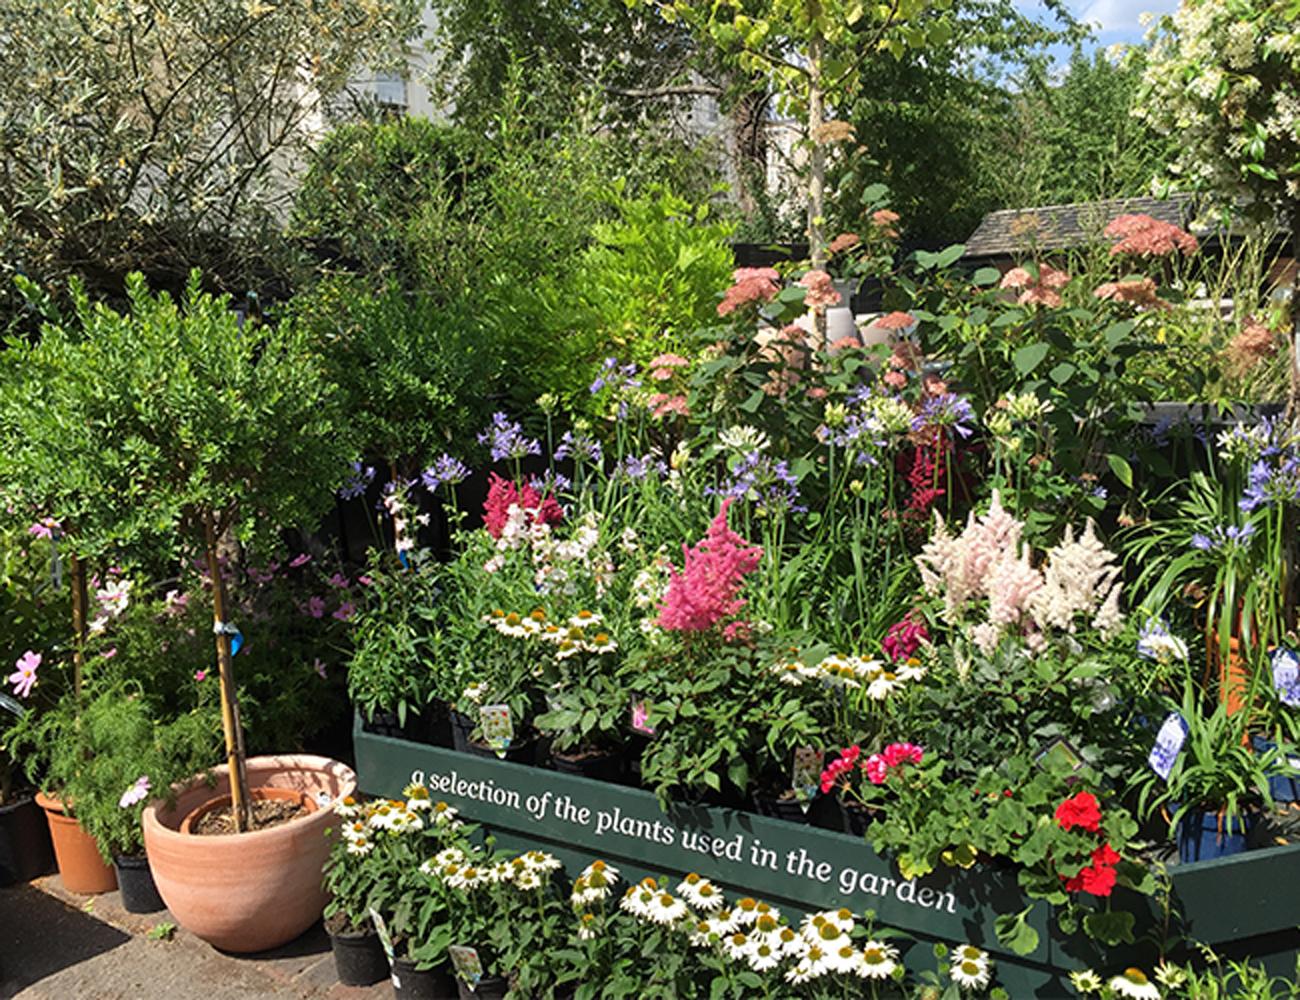 clifton nurseries stylish brunch spot in a winter garden